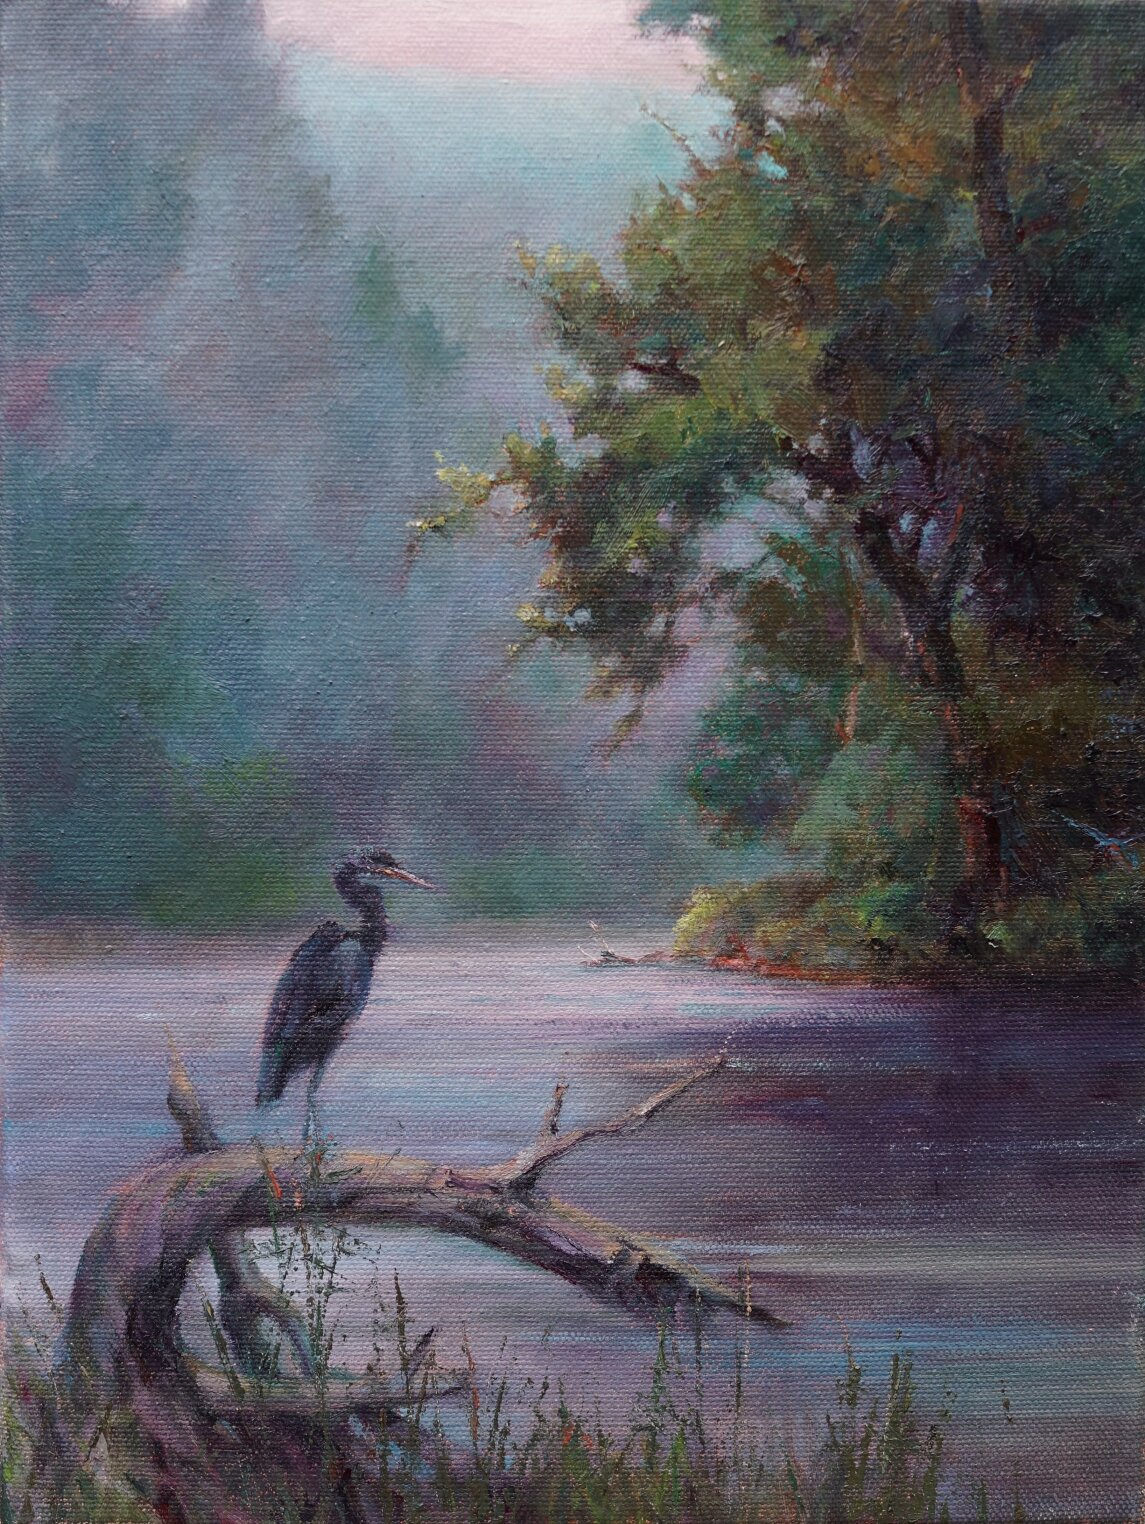 Morning Mist (On the Schoharie) 12x9 $650